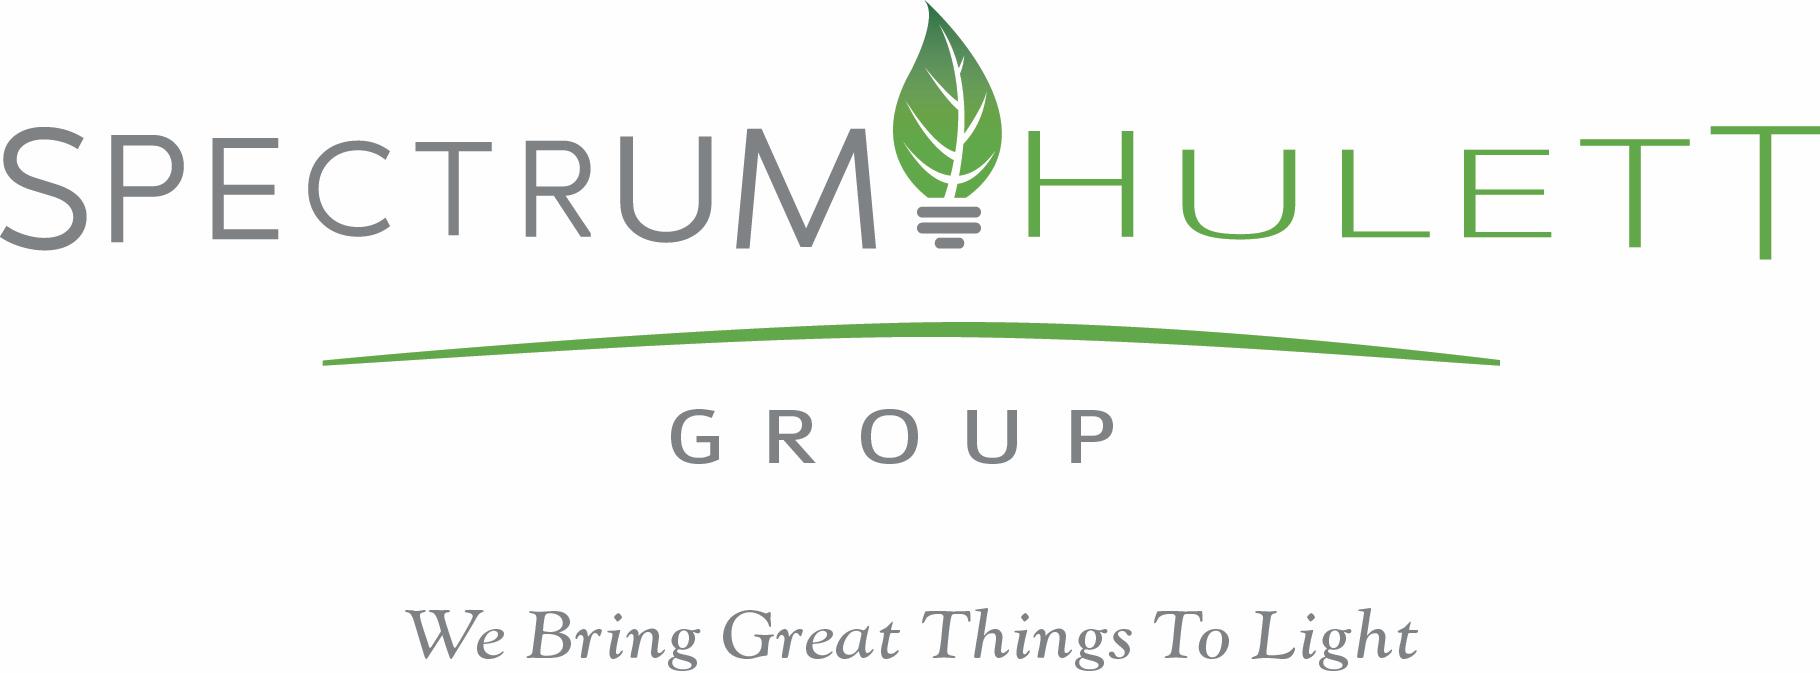 Spectrum Hulett Group lighting sales reps